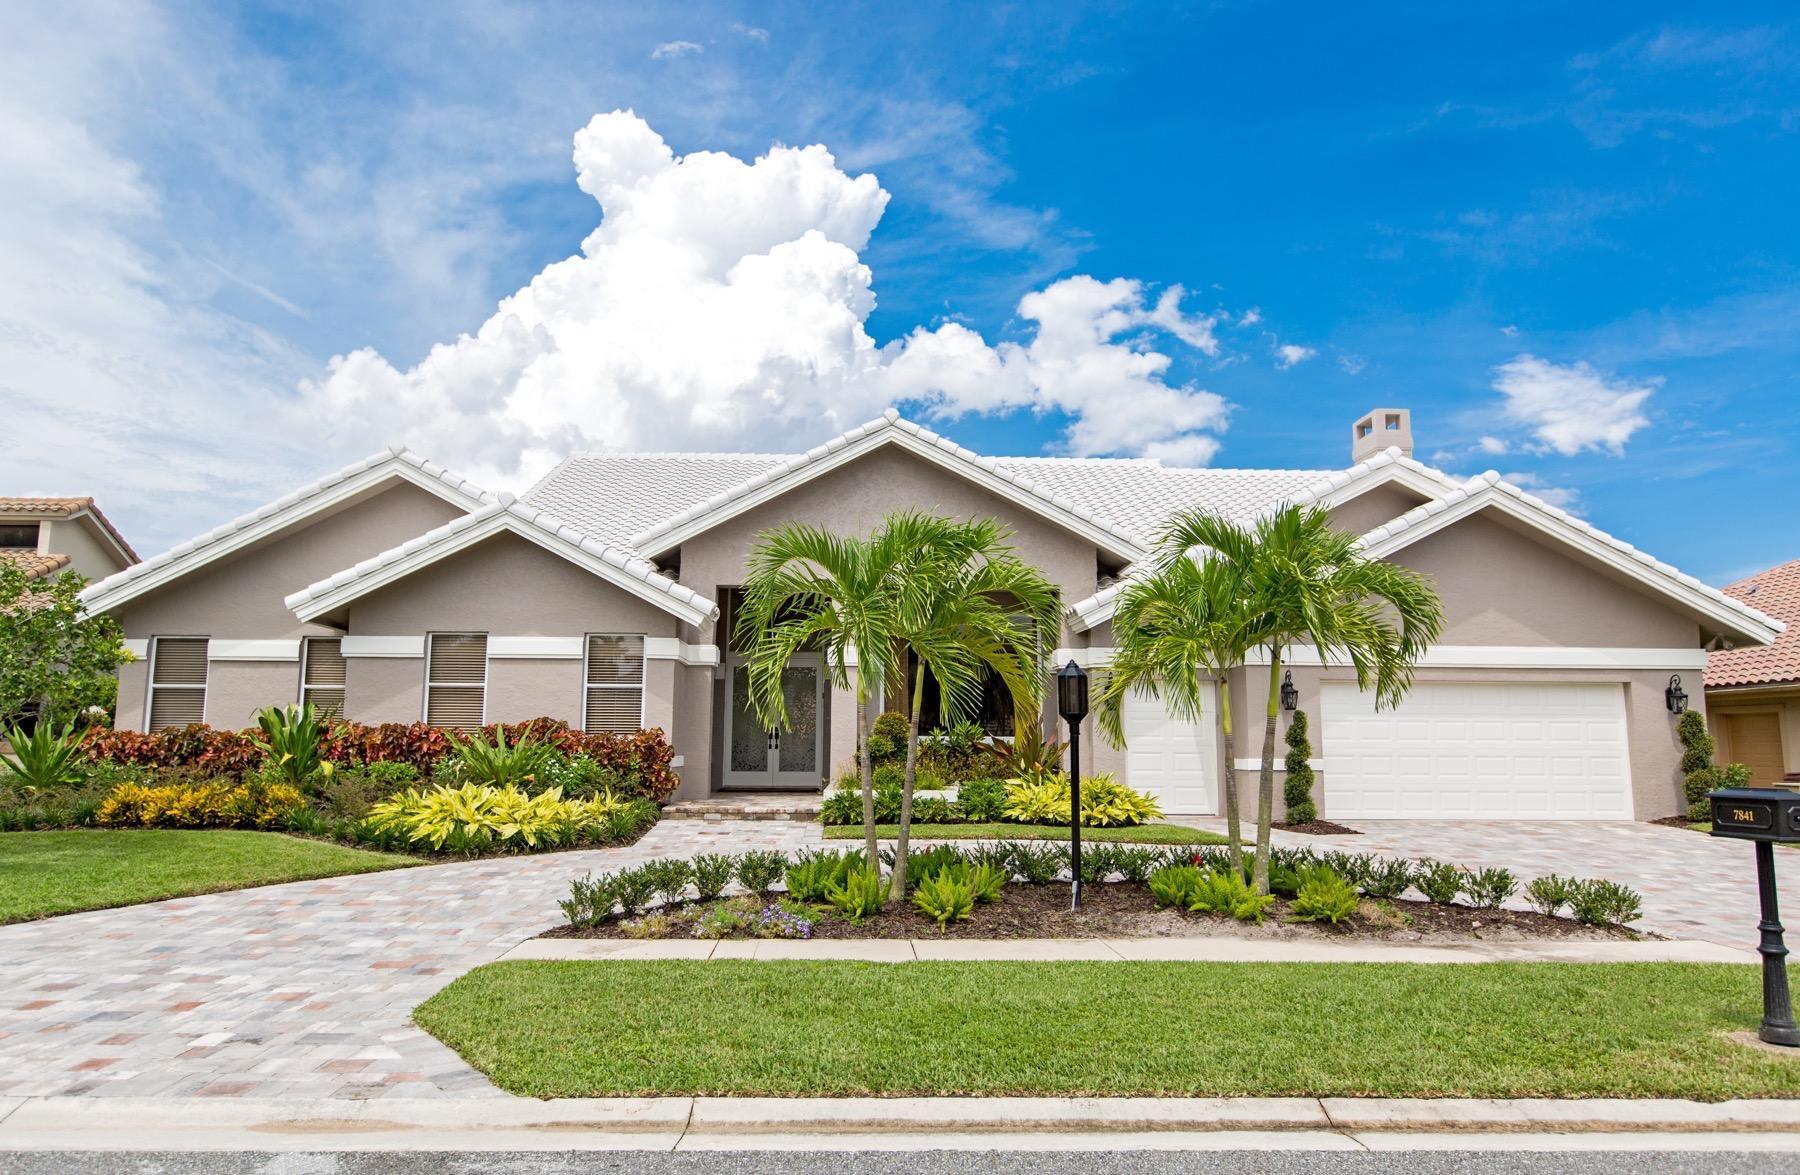 7841 Afton Villa Court  Boca Raton, FL 33433